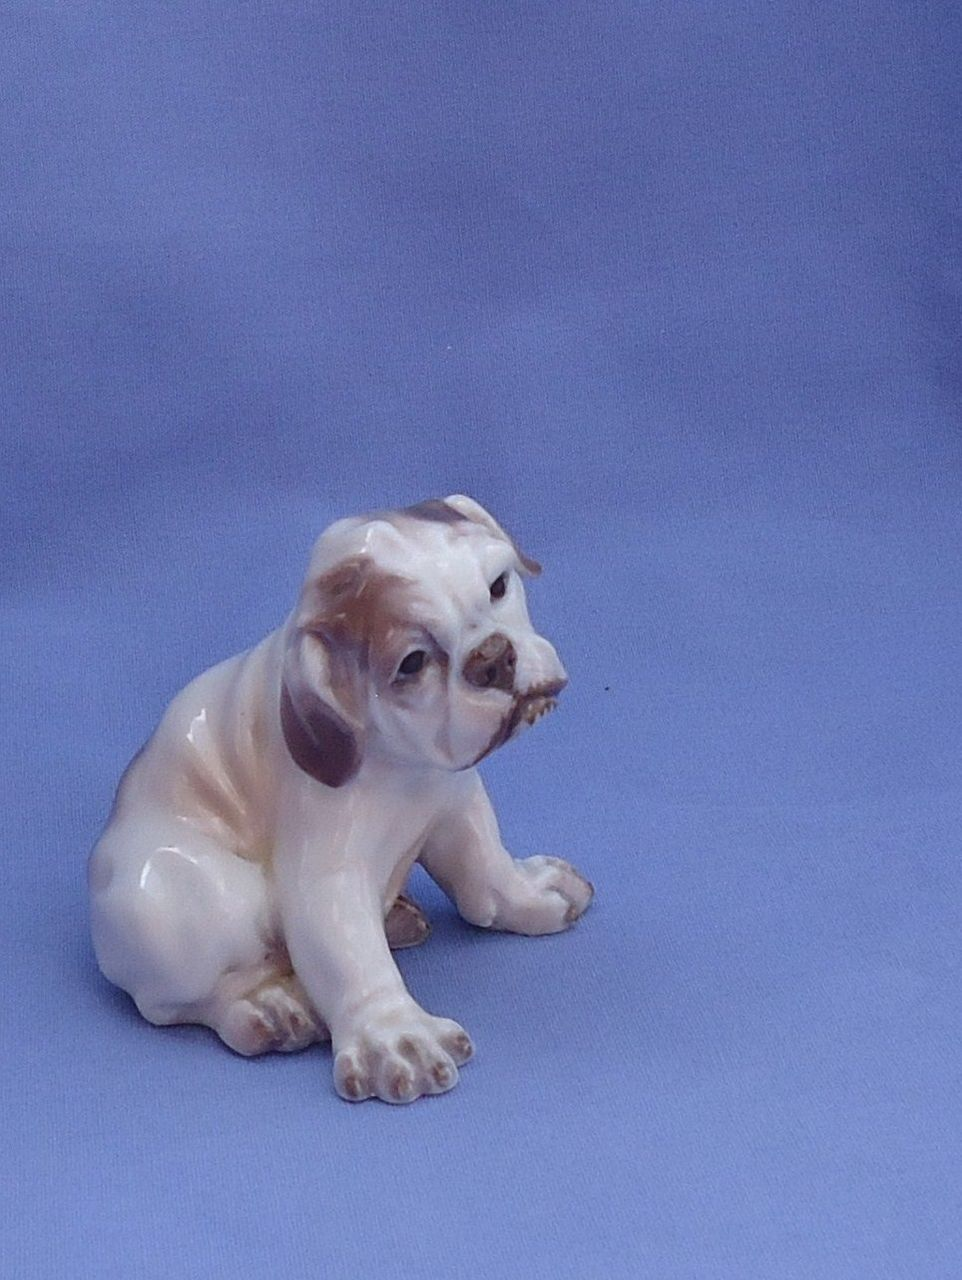 1950s English Bulldog Saint Bernard puppy Dahl Jensen